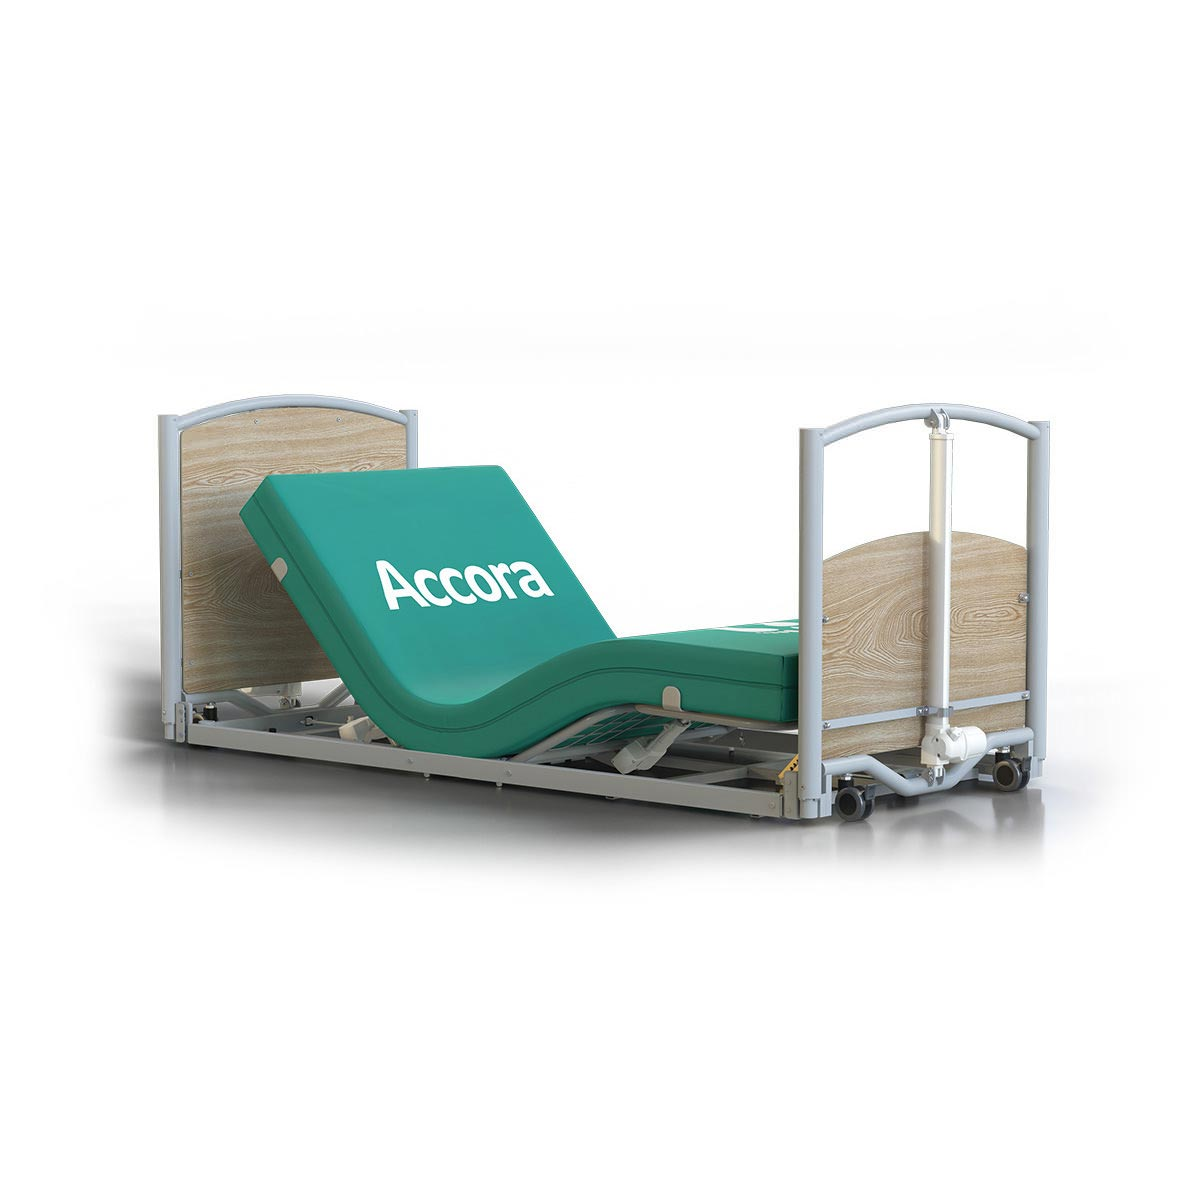 Accora Beds